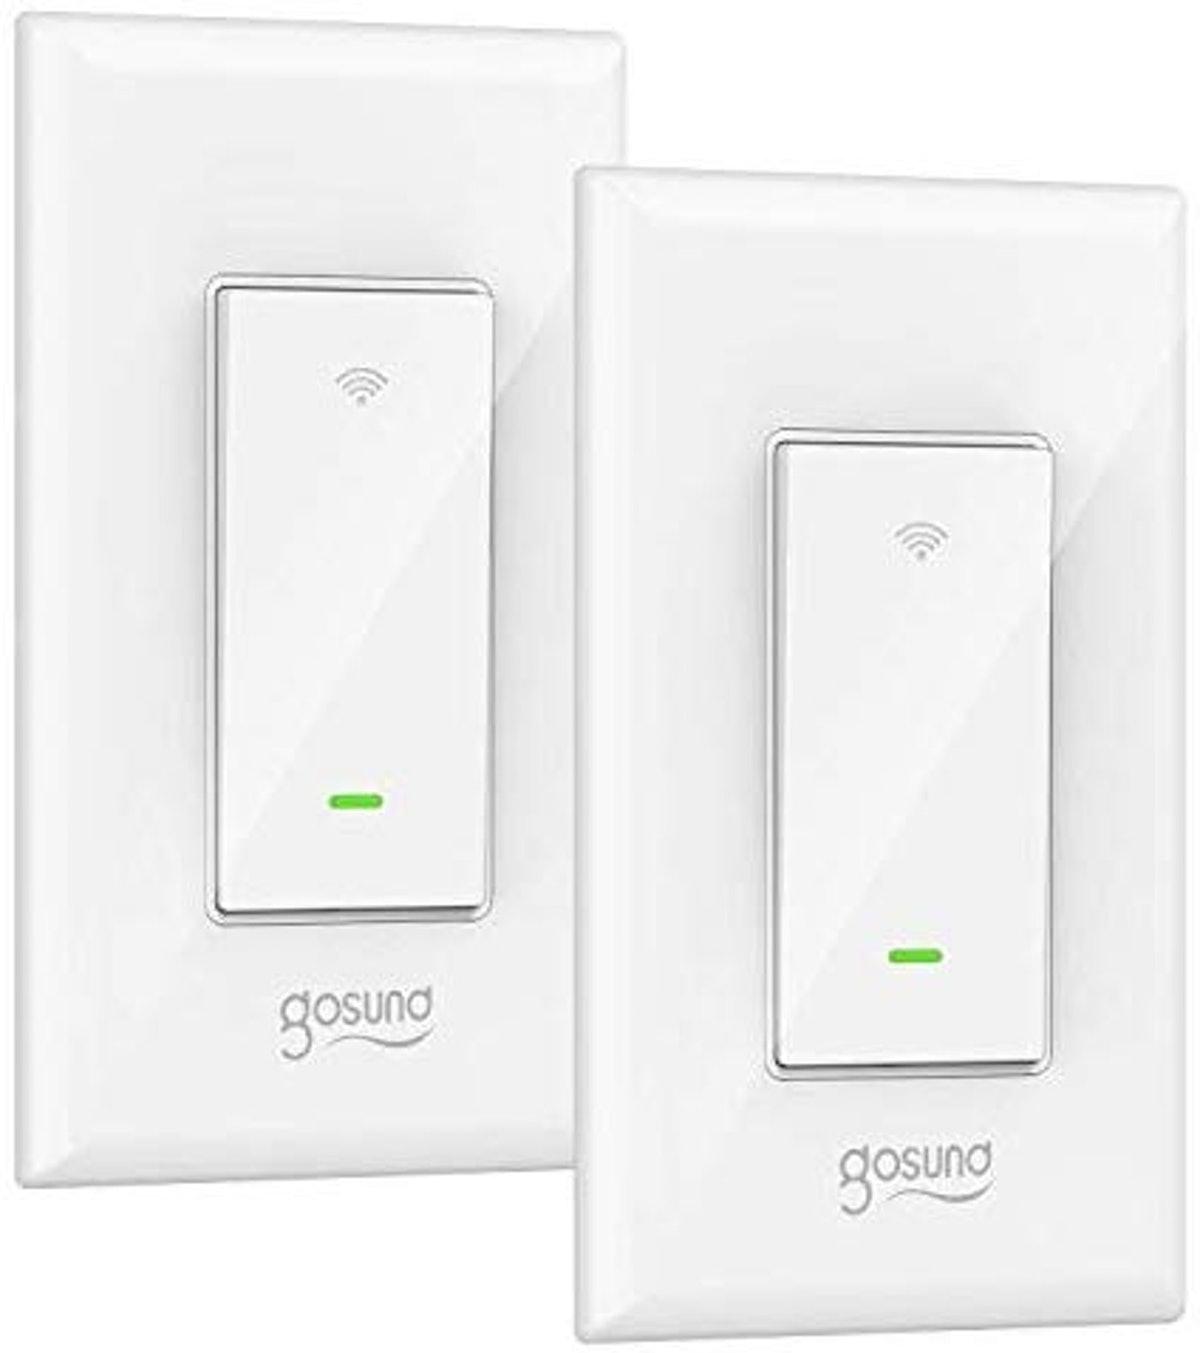 Gosund Smart Light Switch (2-Pack)